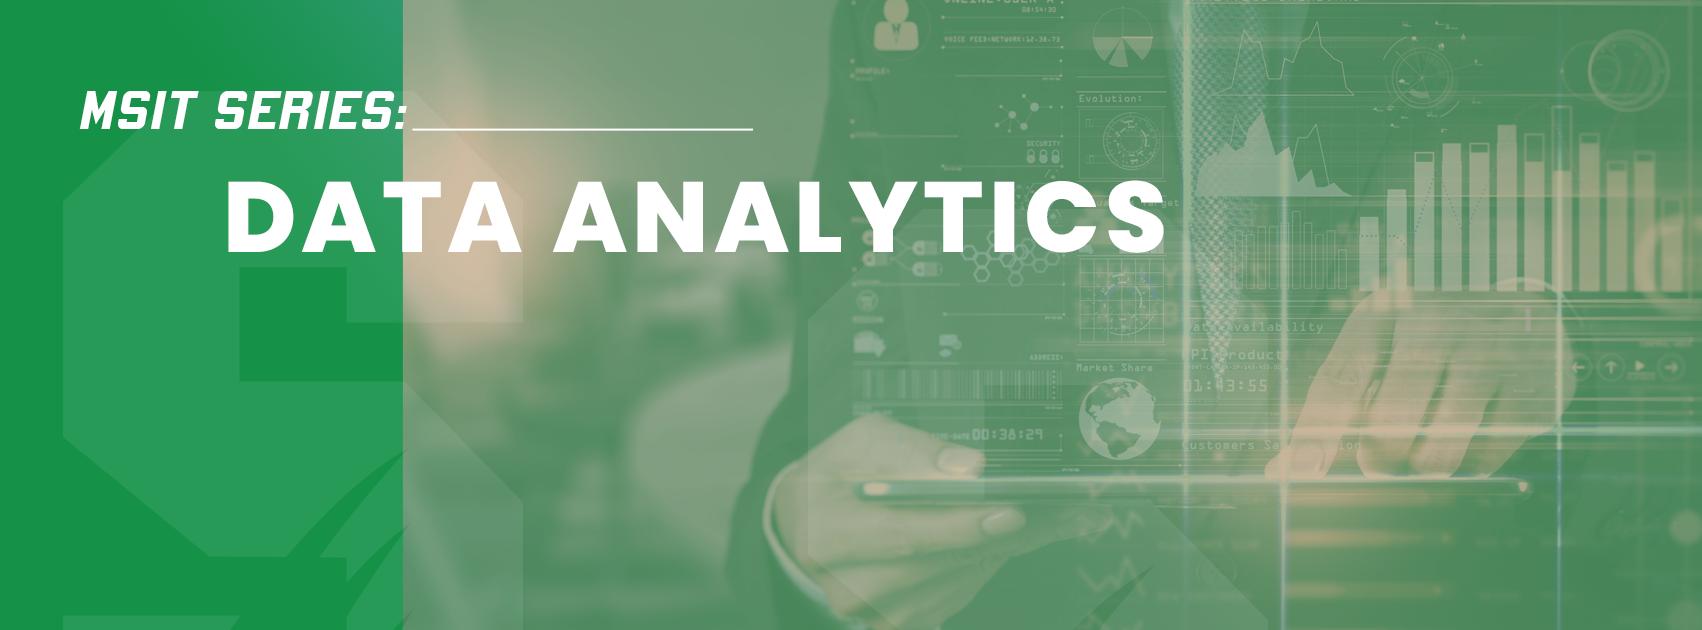 MSIT Series: Data Analytics